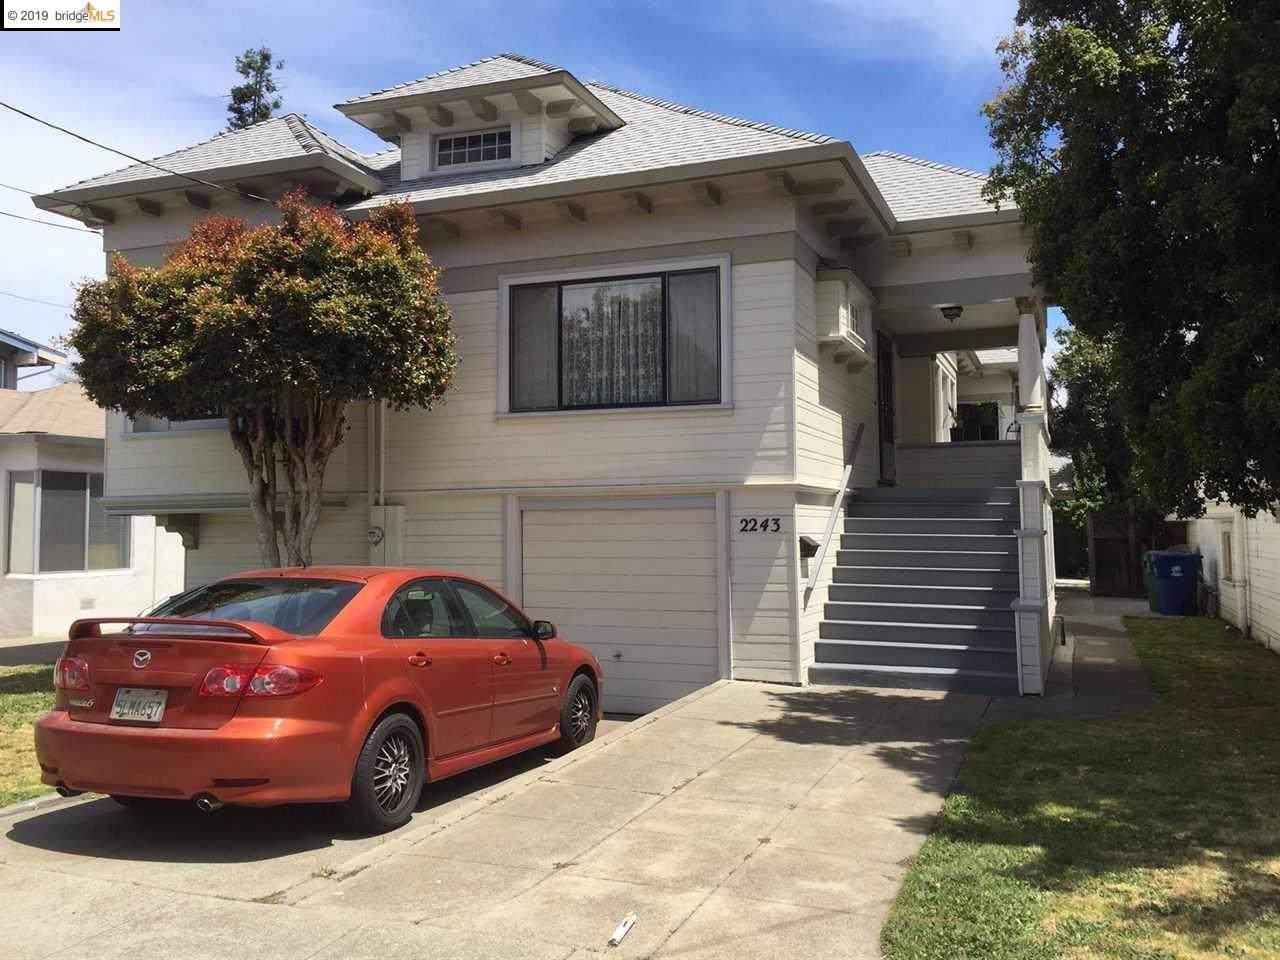 2243 Buena Vista Avenue - Photo 1